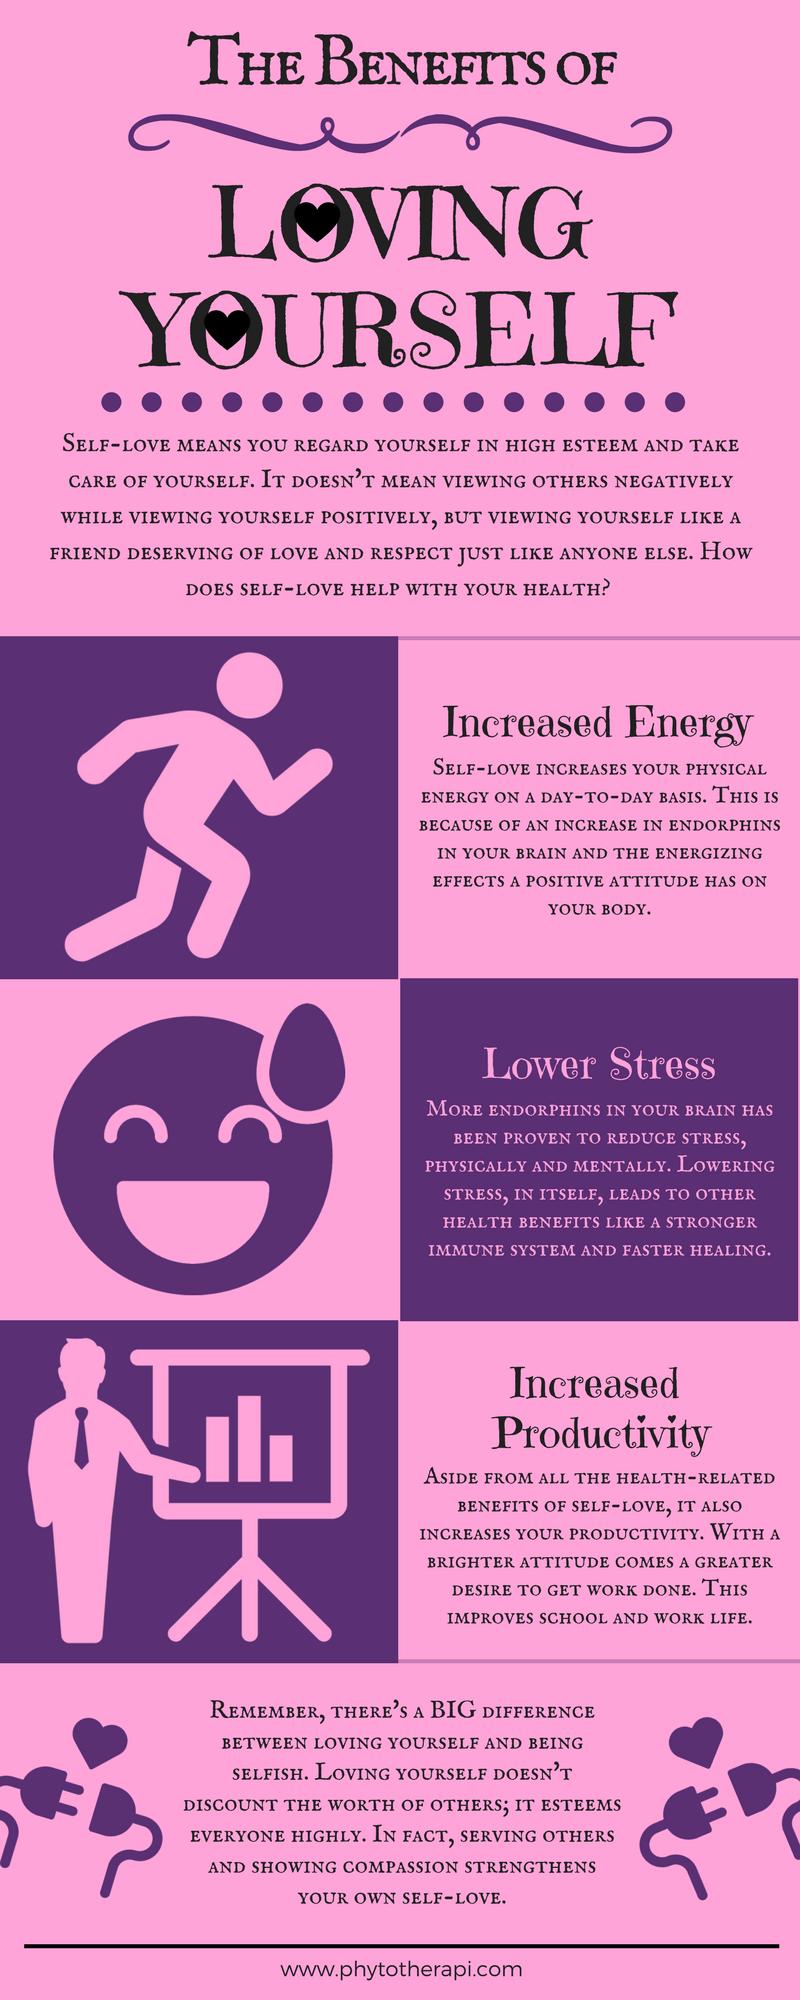 Benefits Of Self-Love